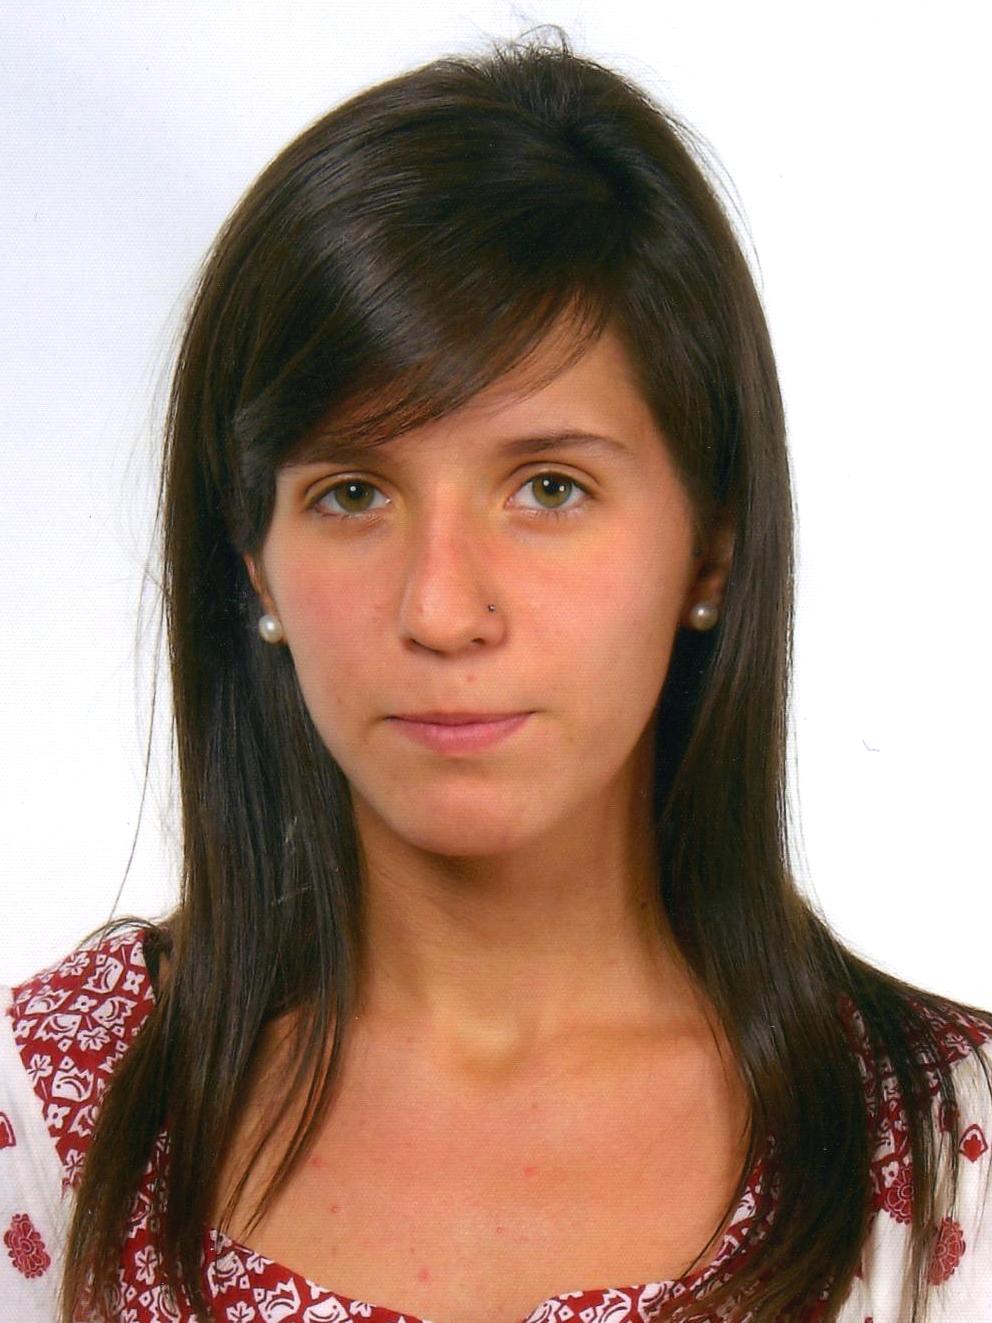 Blanca Alonso Jimenez